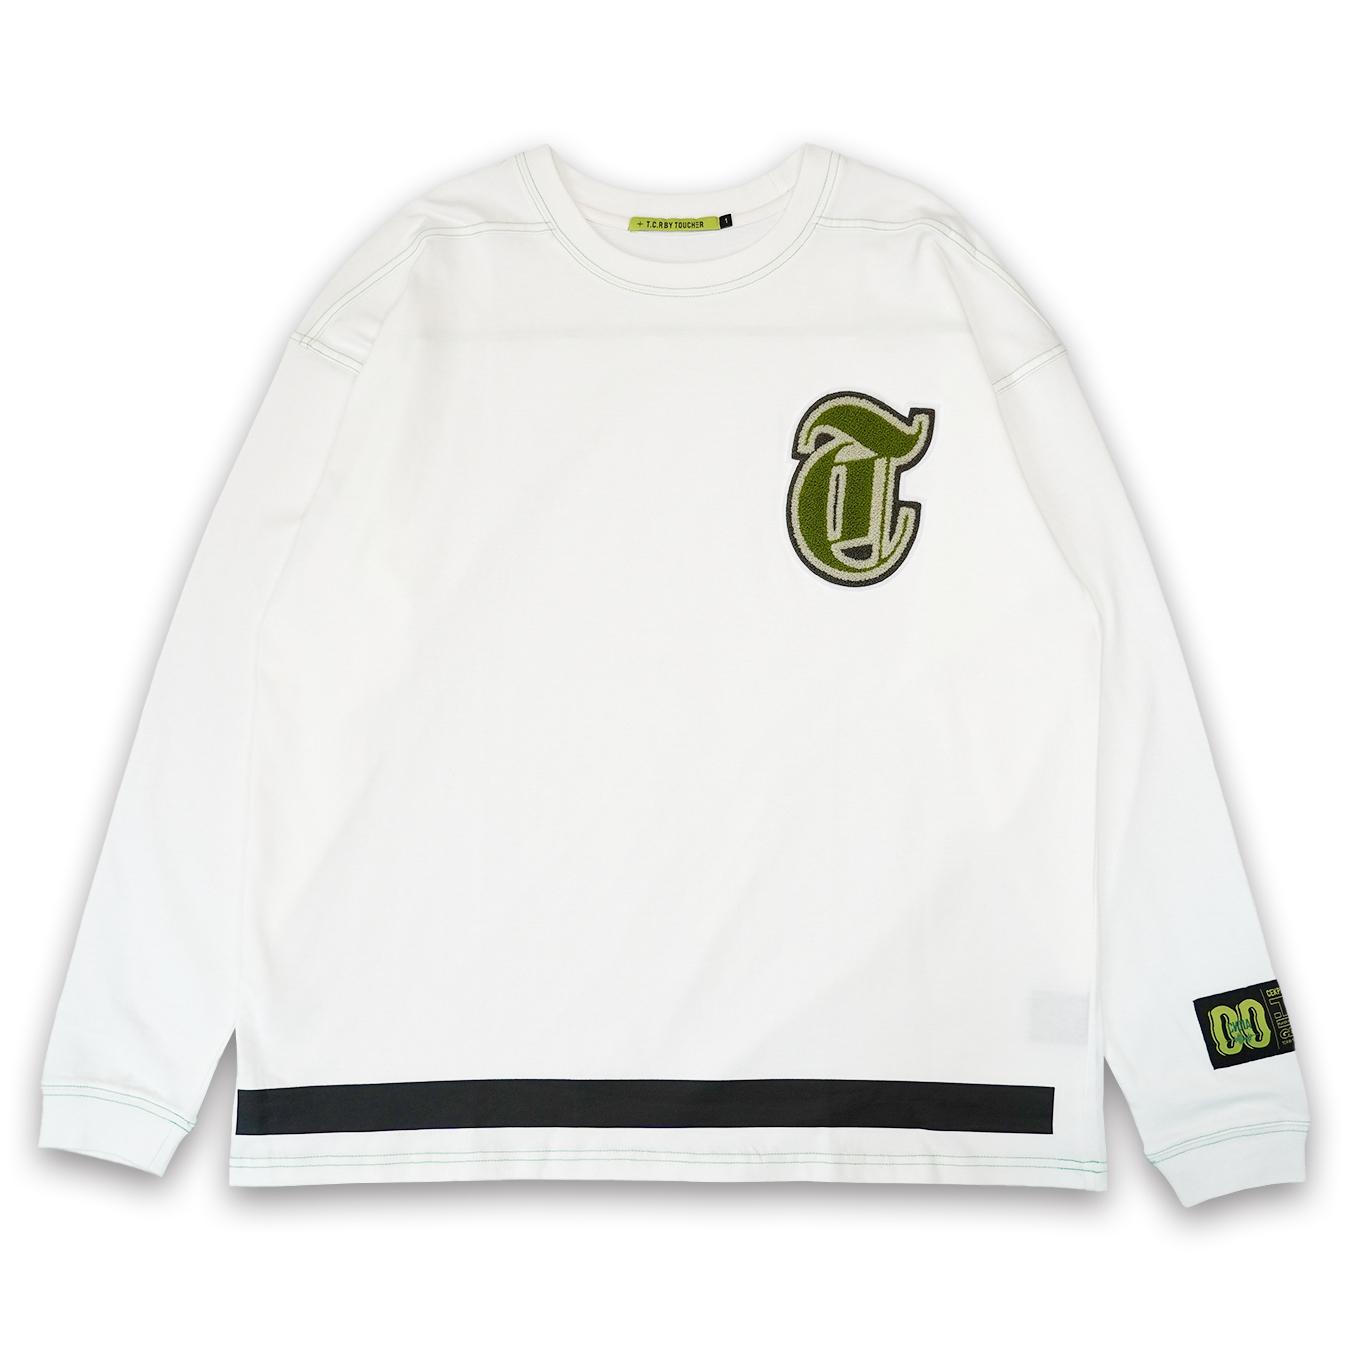 T.C.R CHENILLE LOGO L/S TEE - WHITE